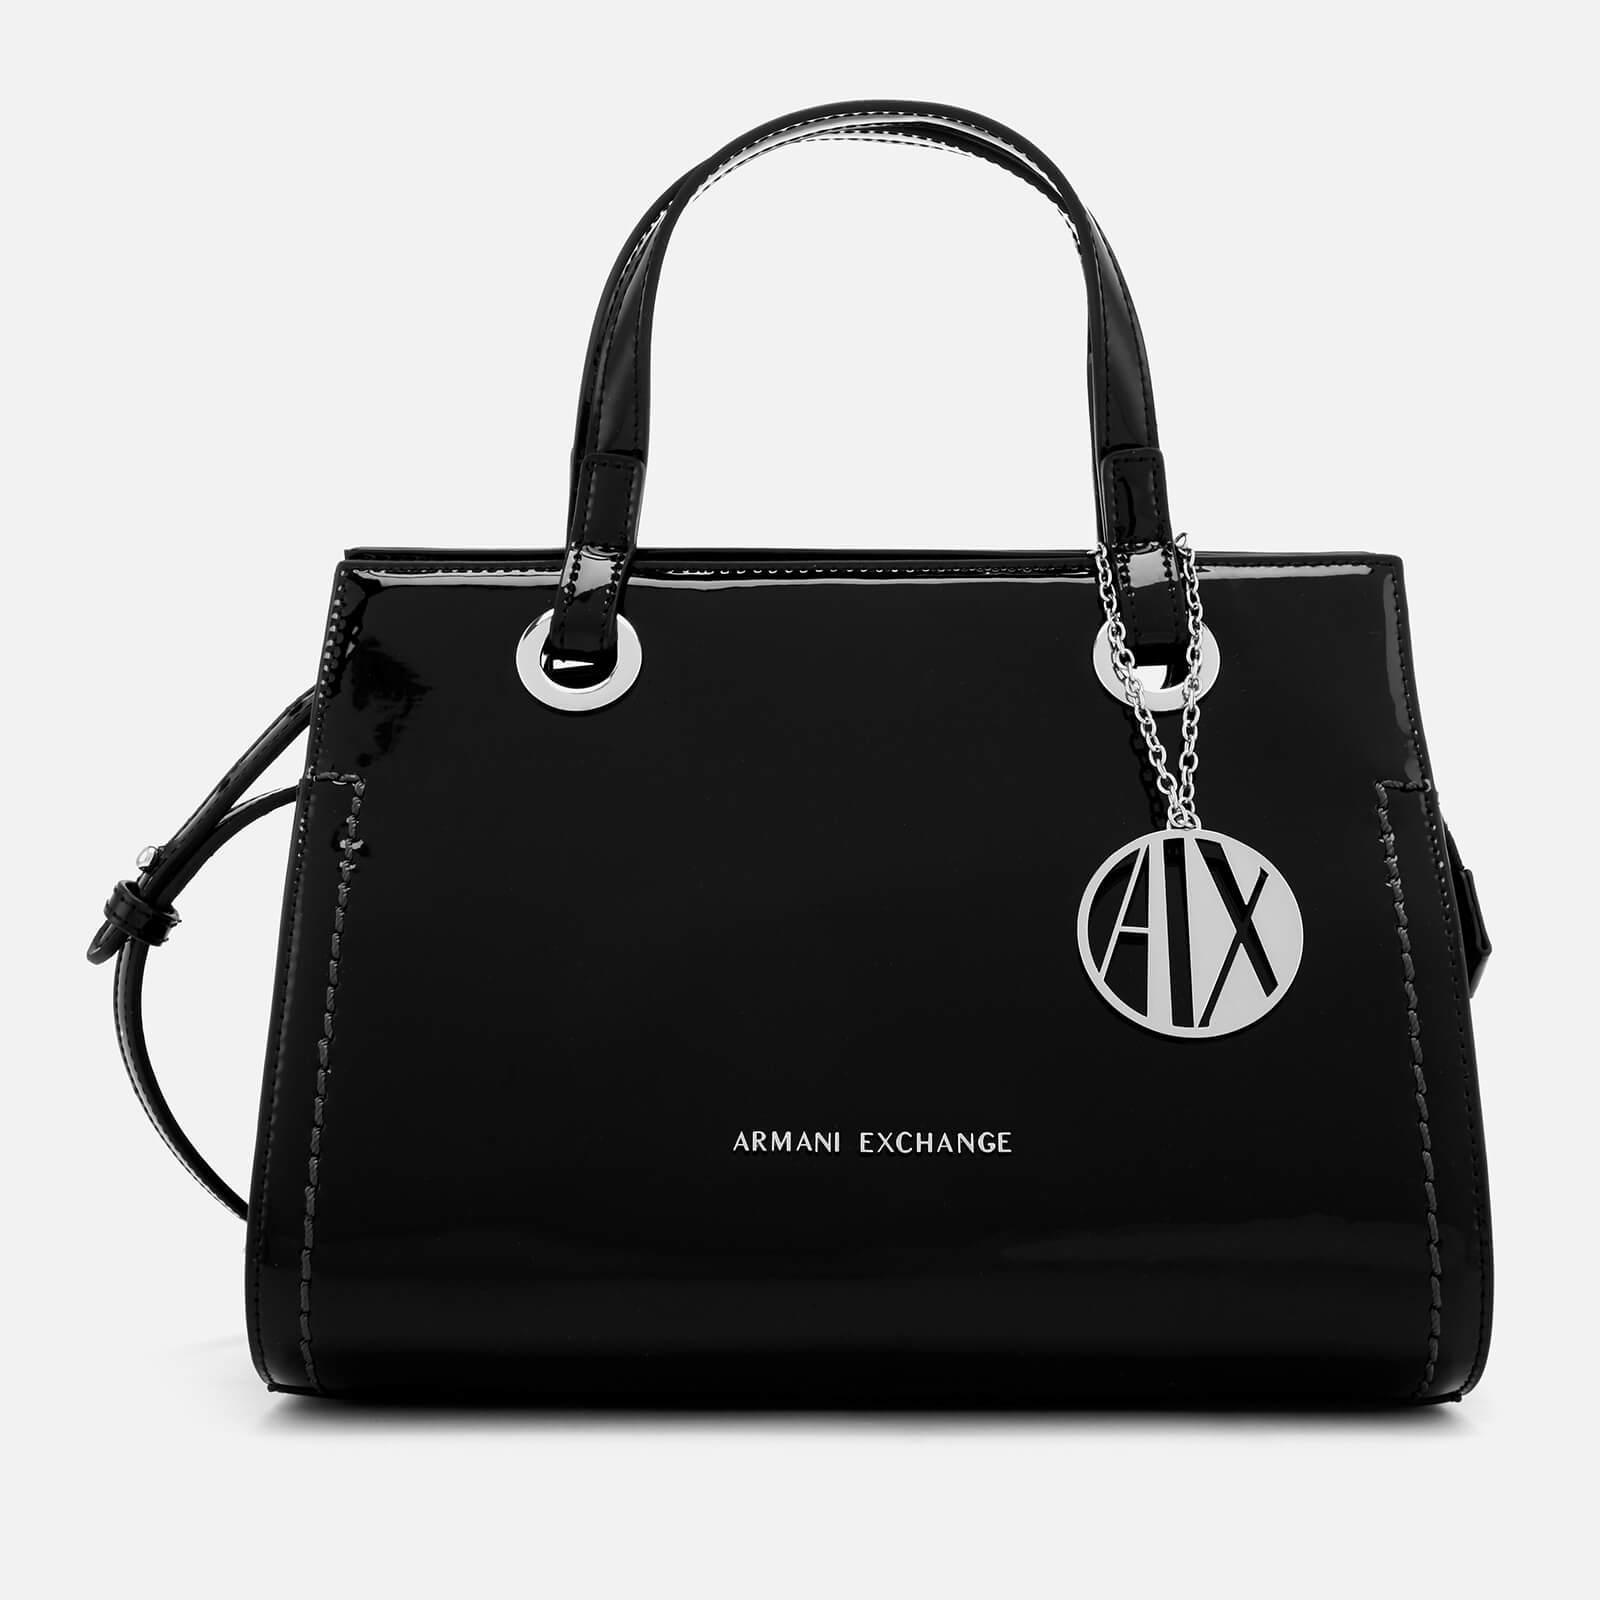 a8f5ea9b477 Armani Exchange - Black Patent Logo Small Tote Bag - Lyst. View fullscreen